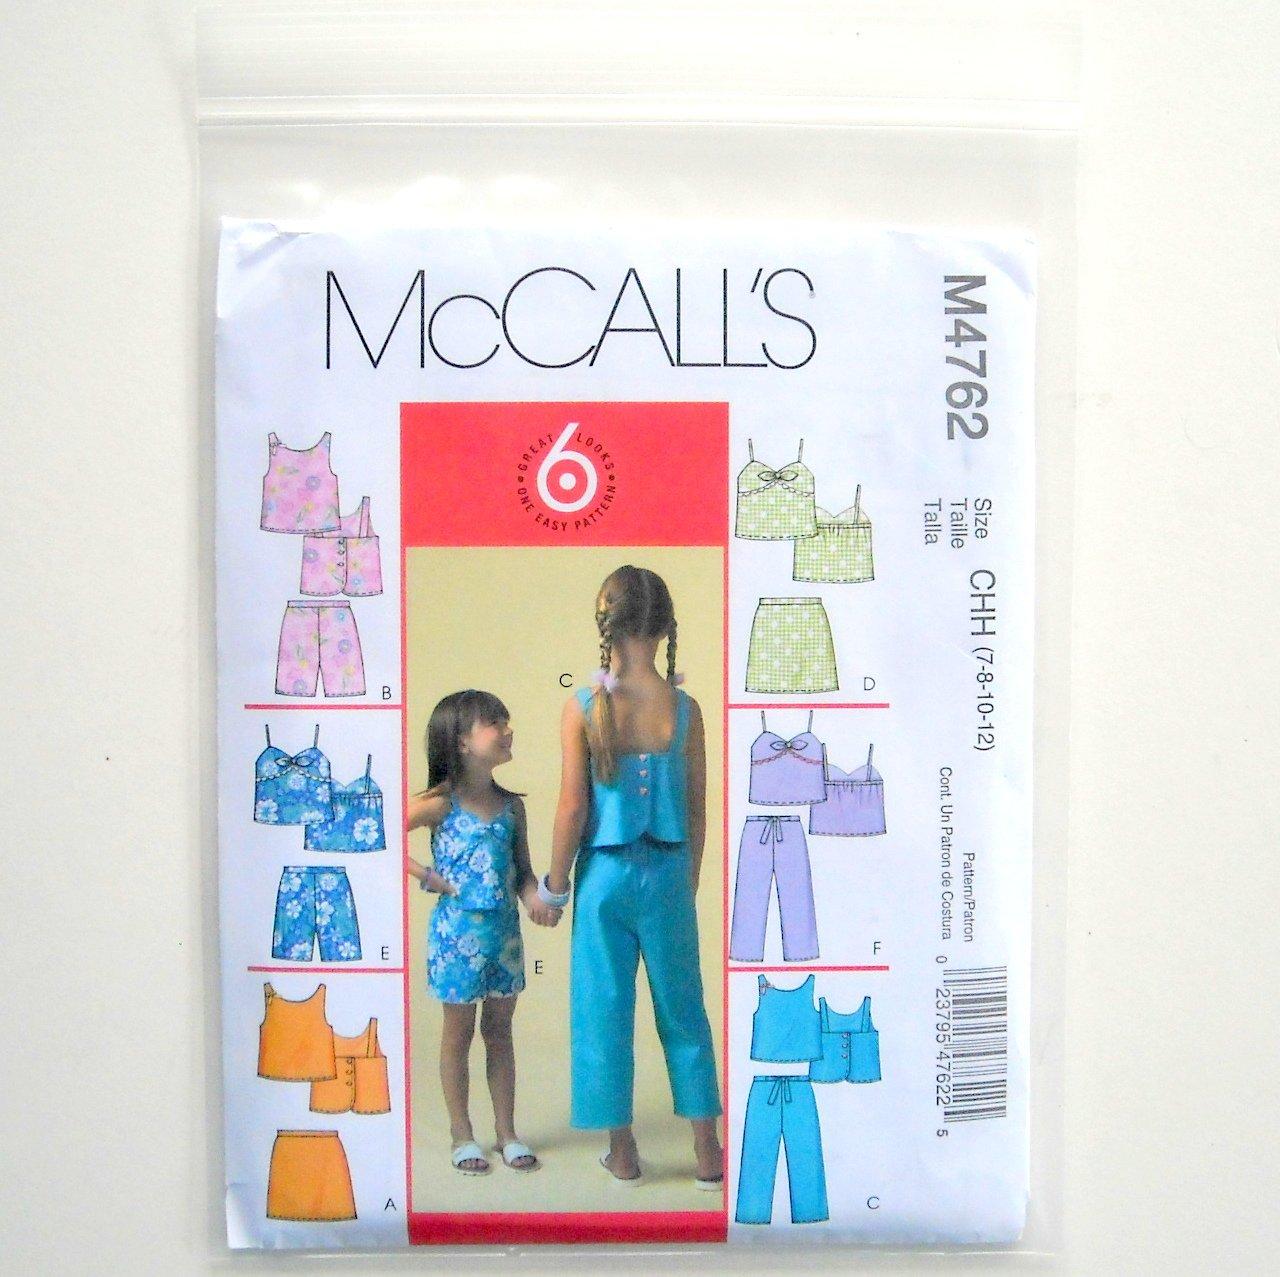 McCalls 6 Great Looks Girls Tops Skorts Shorts Capri Pants Size CHH 7 - 12 Sewing Pattern M4762